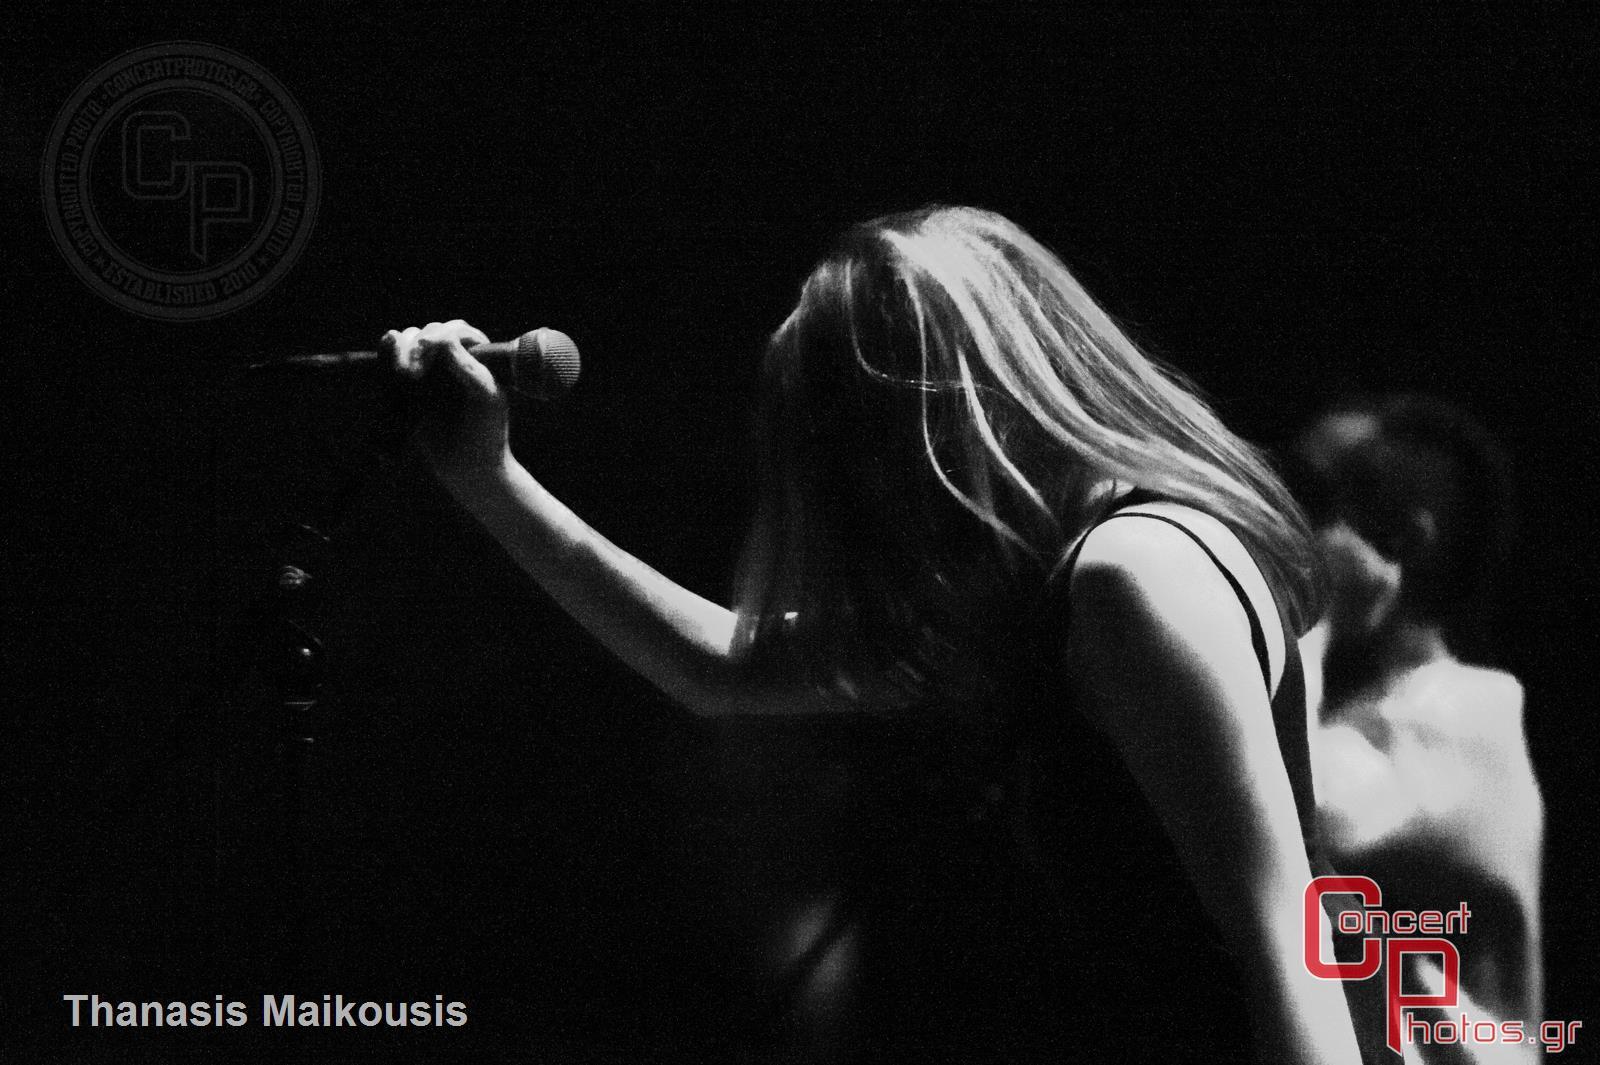 Tricky - Spectralfire-Tricky - Spectralfire photographer: Thanasis Maikousis - concertphotos_-3761